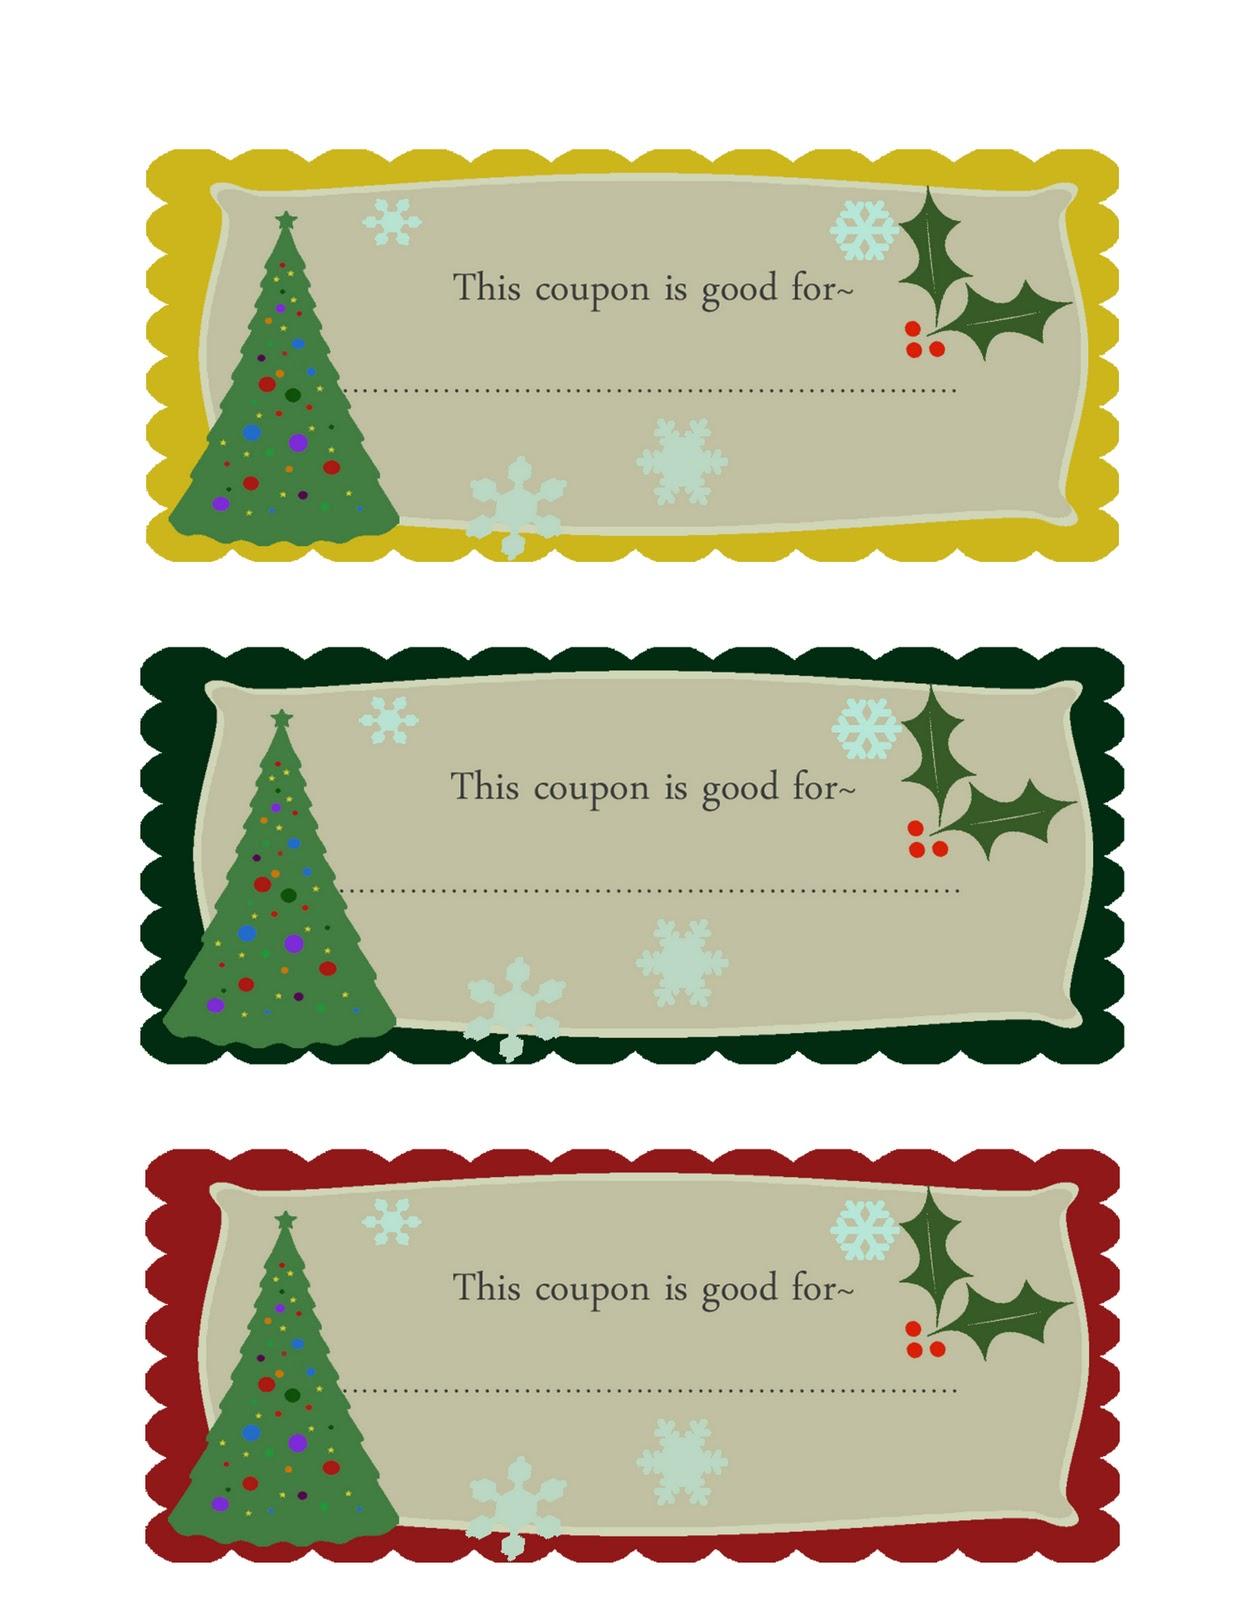 Voucher Book Template 14 Coupon Templates Free Sample Example – Coupon Book Template